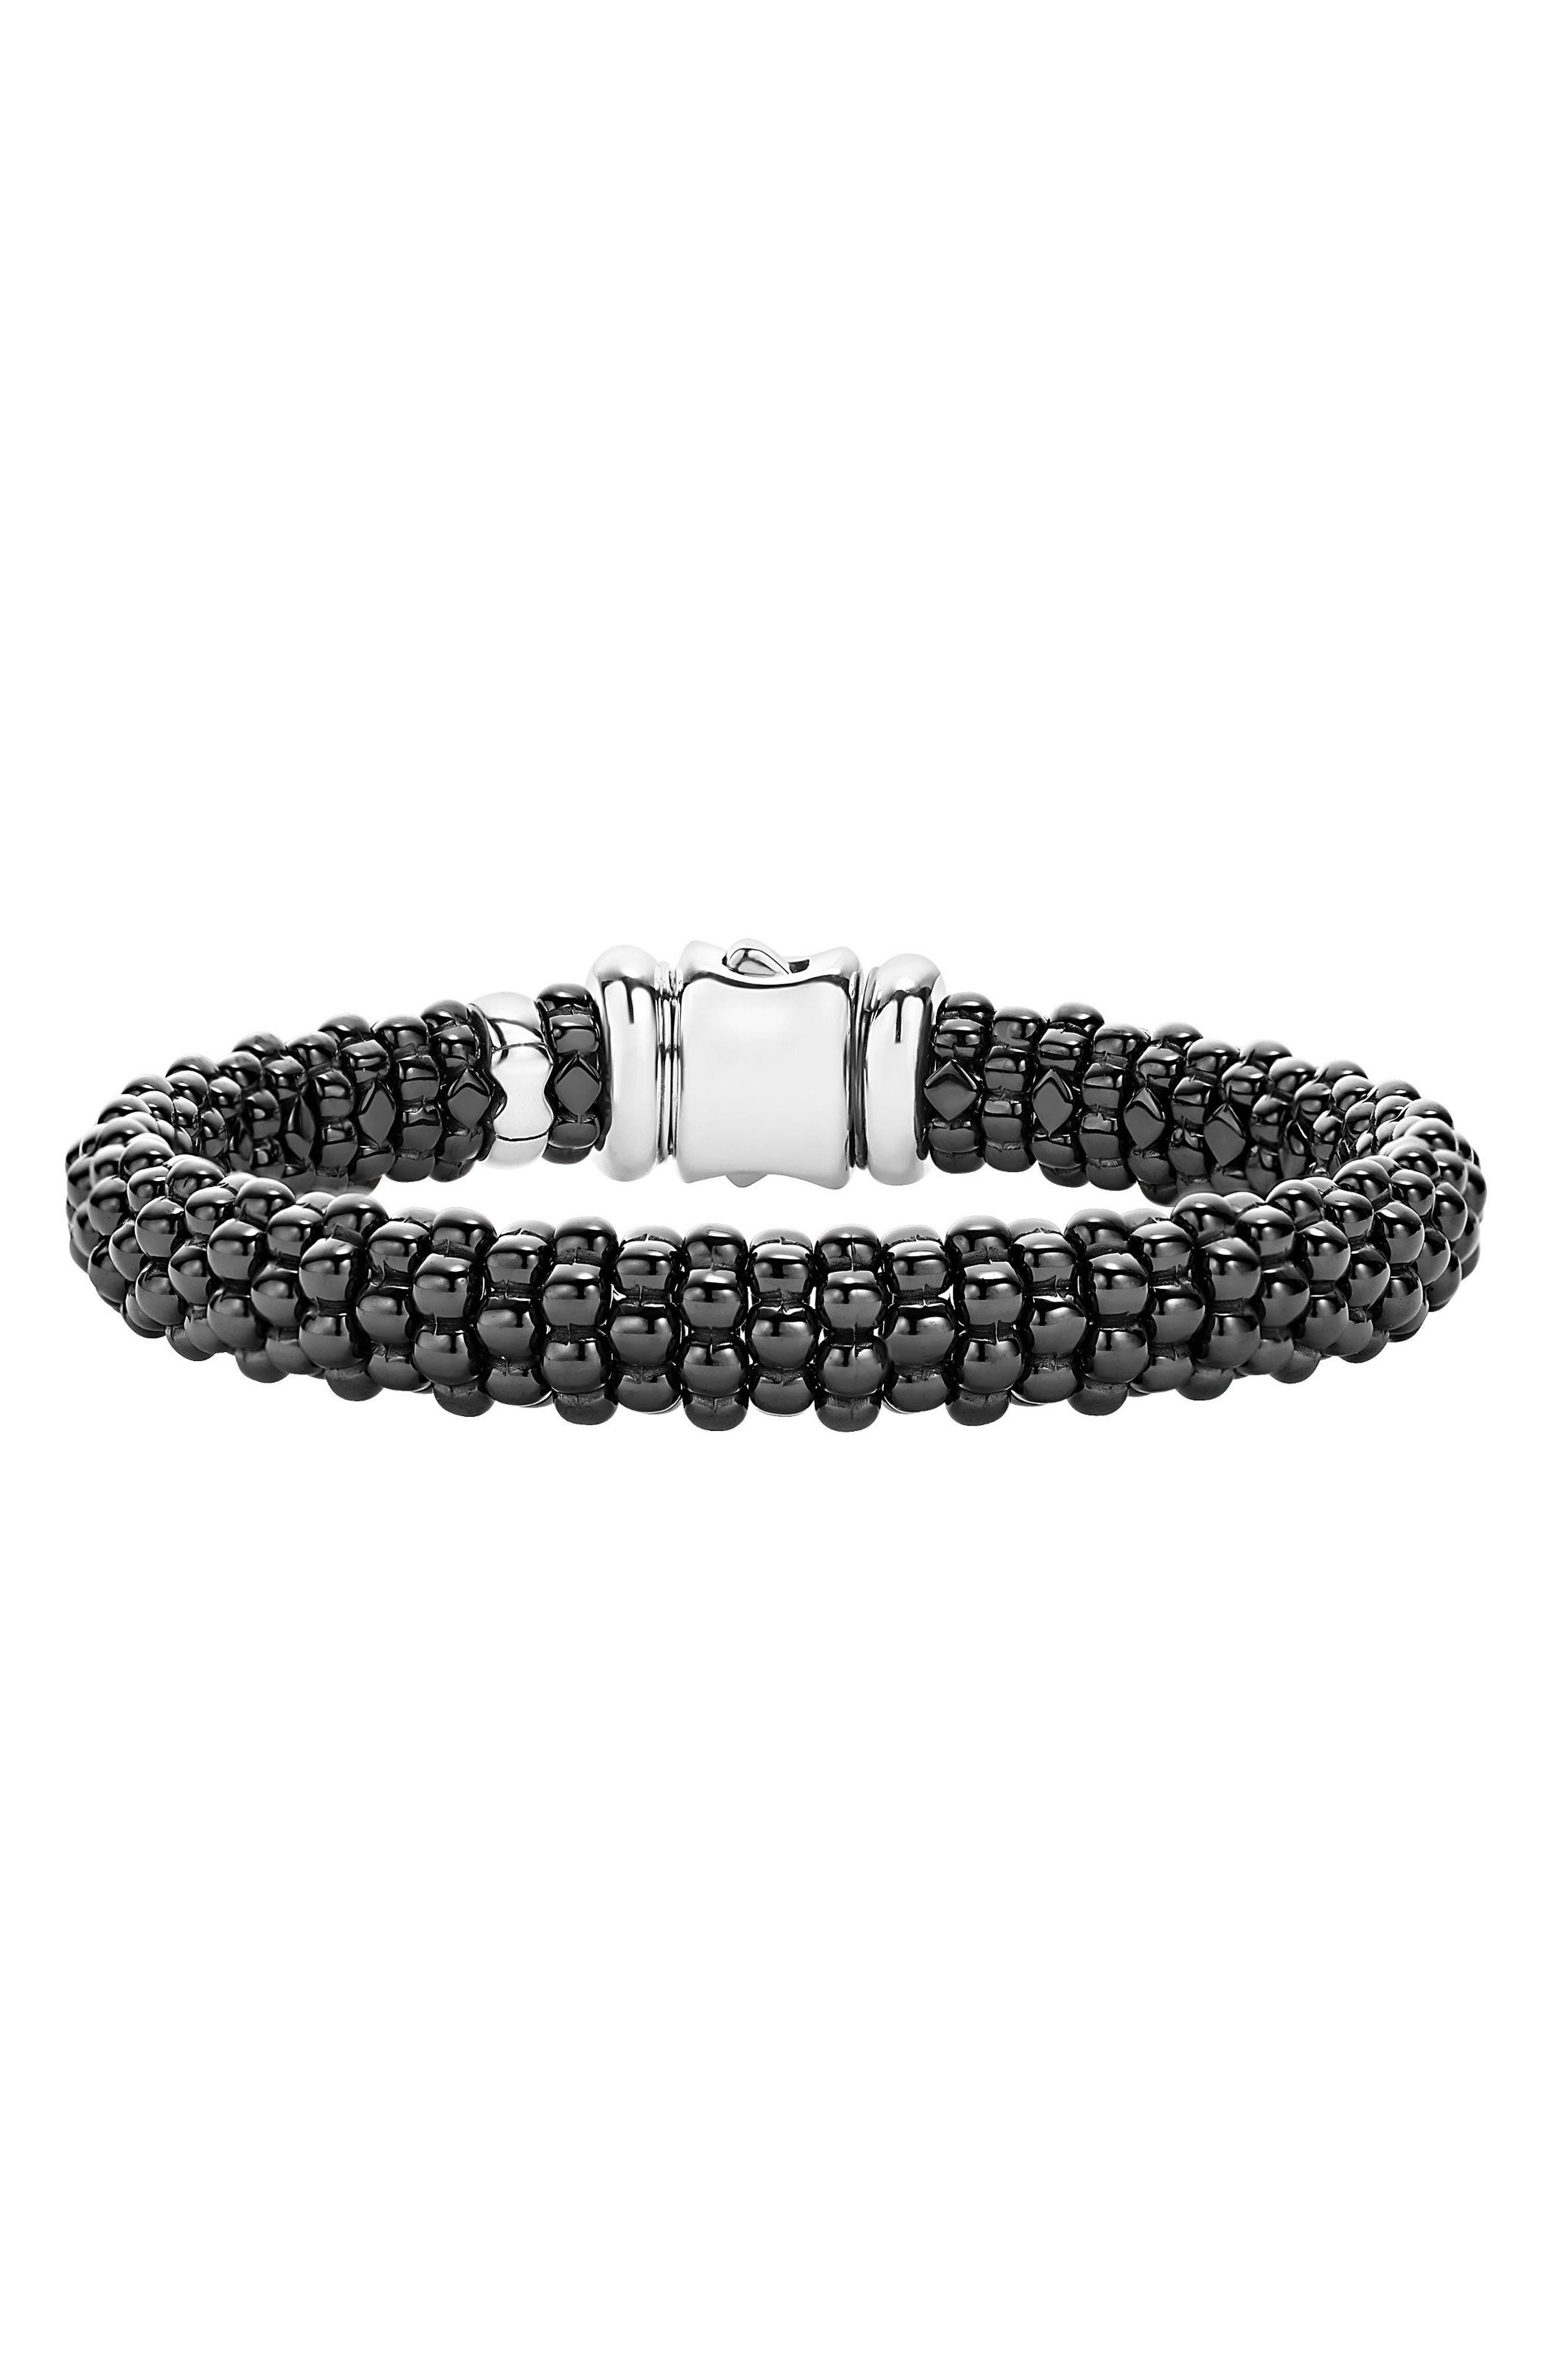 LAGOS Black Caviar Bracelet, Main, color, BLACK CAVIAR